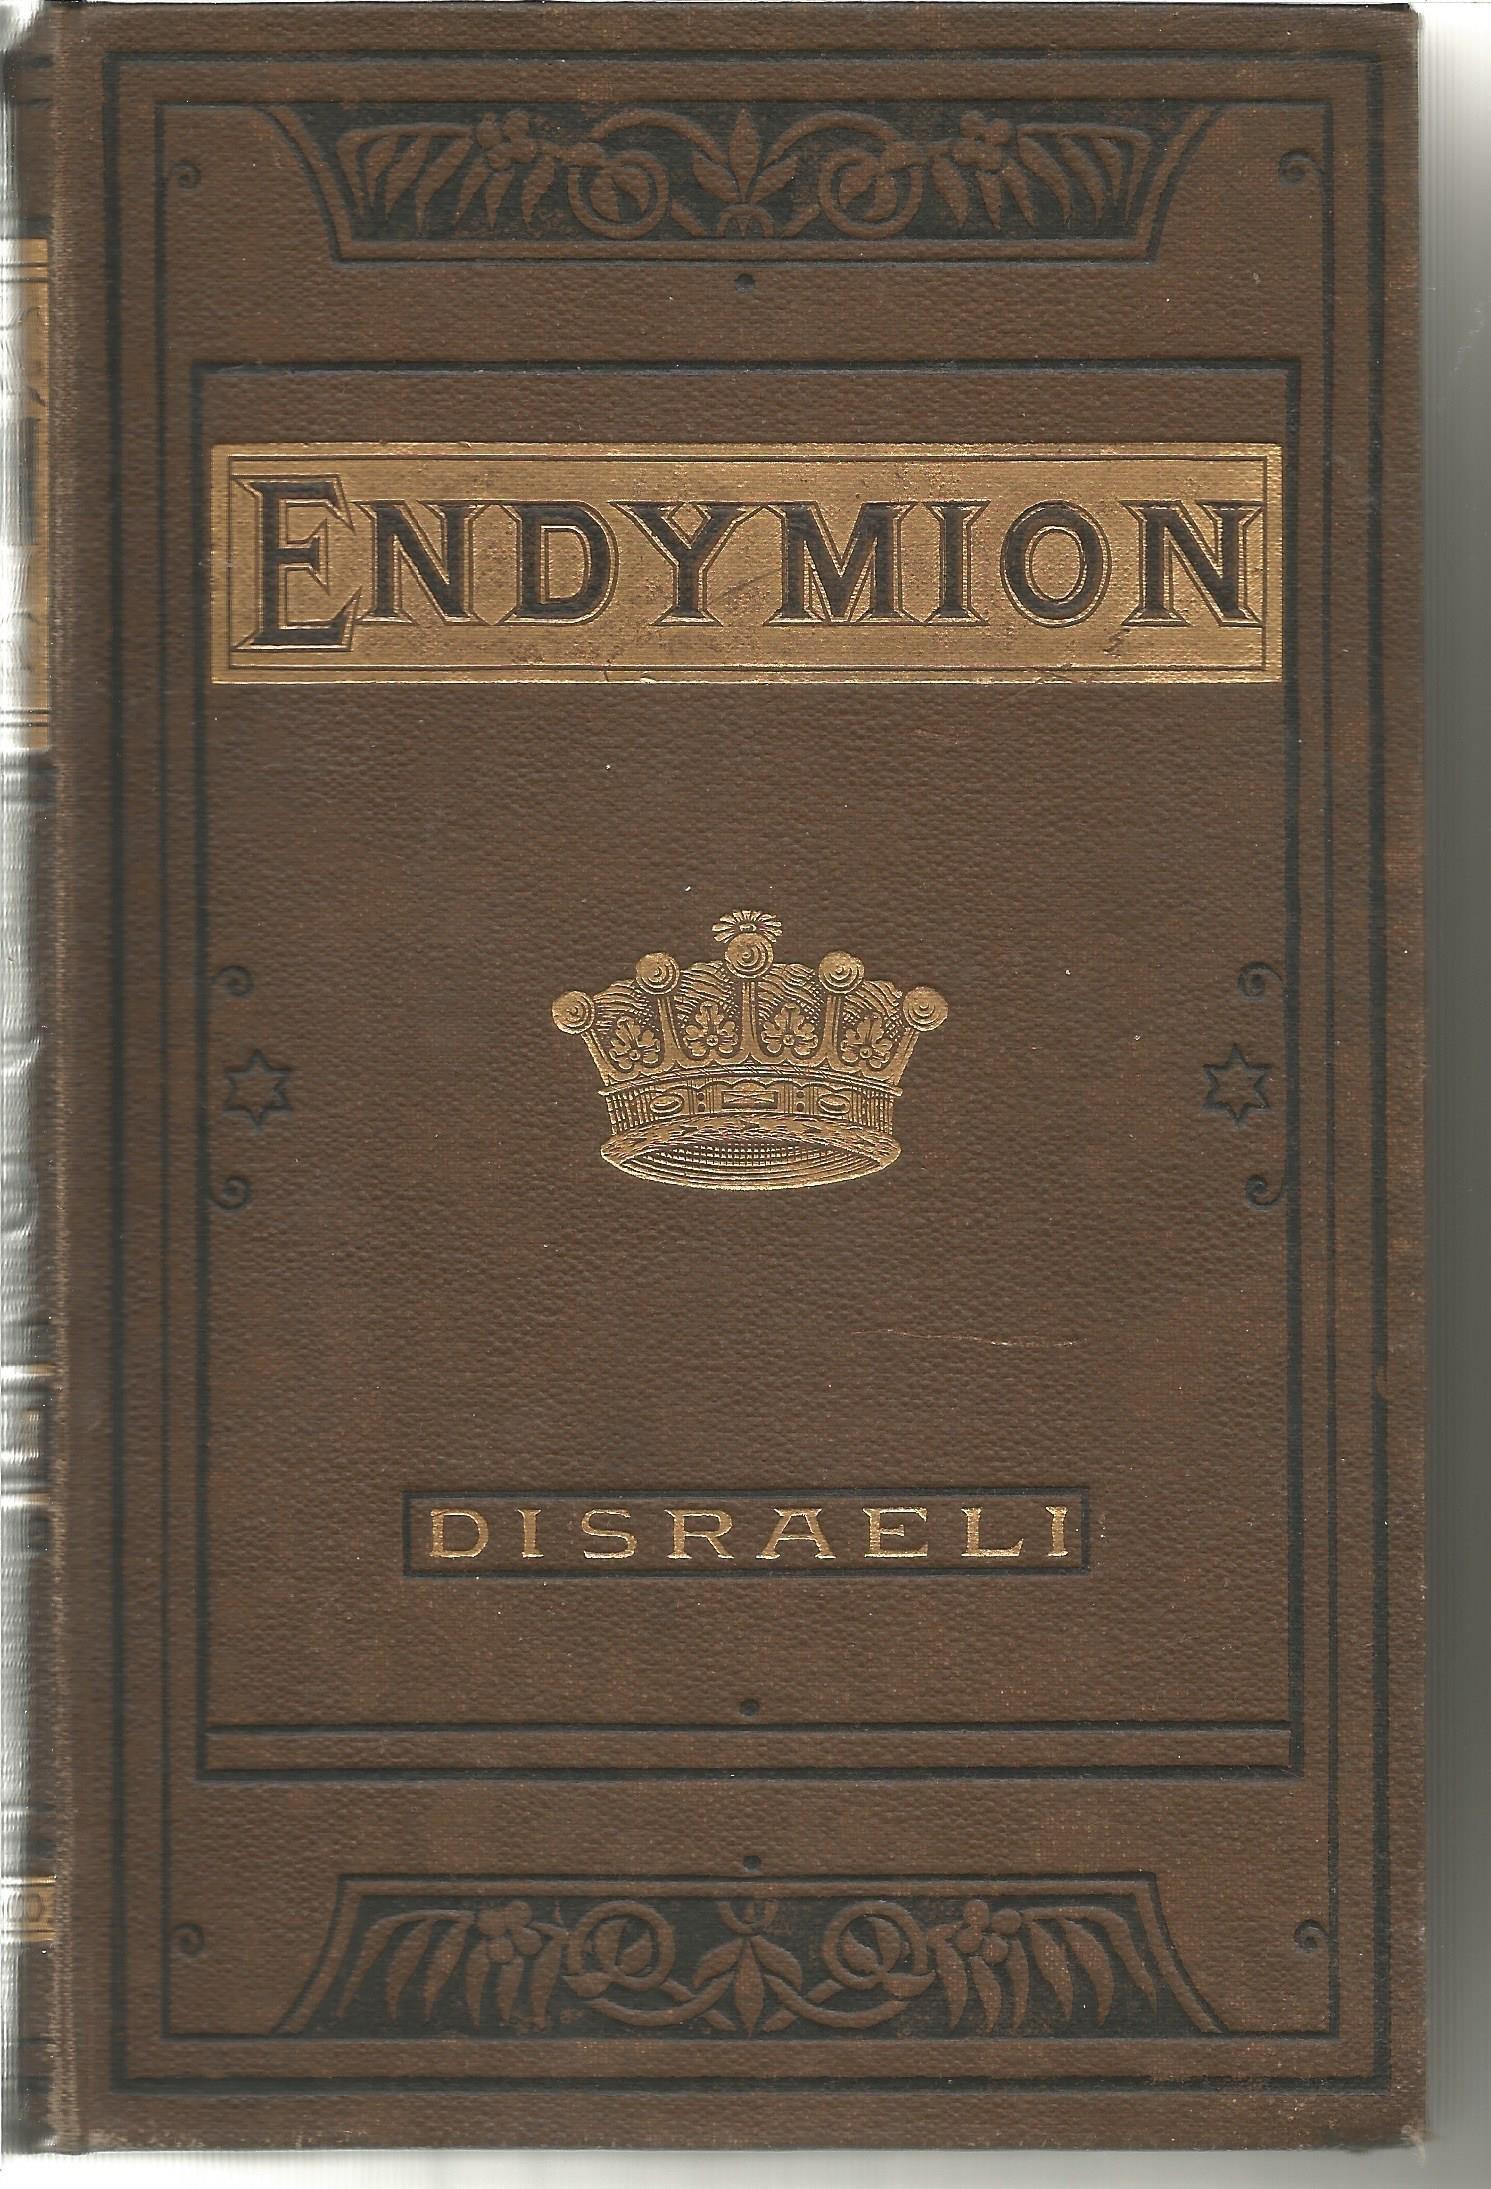 Endymion hardback book. New edition. Good Condition.